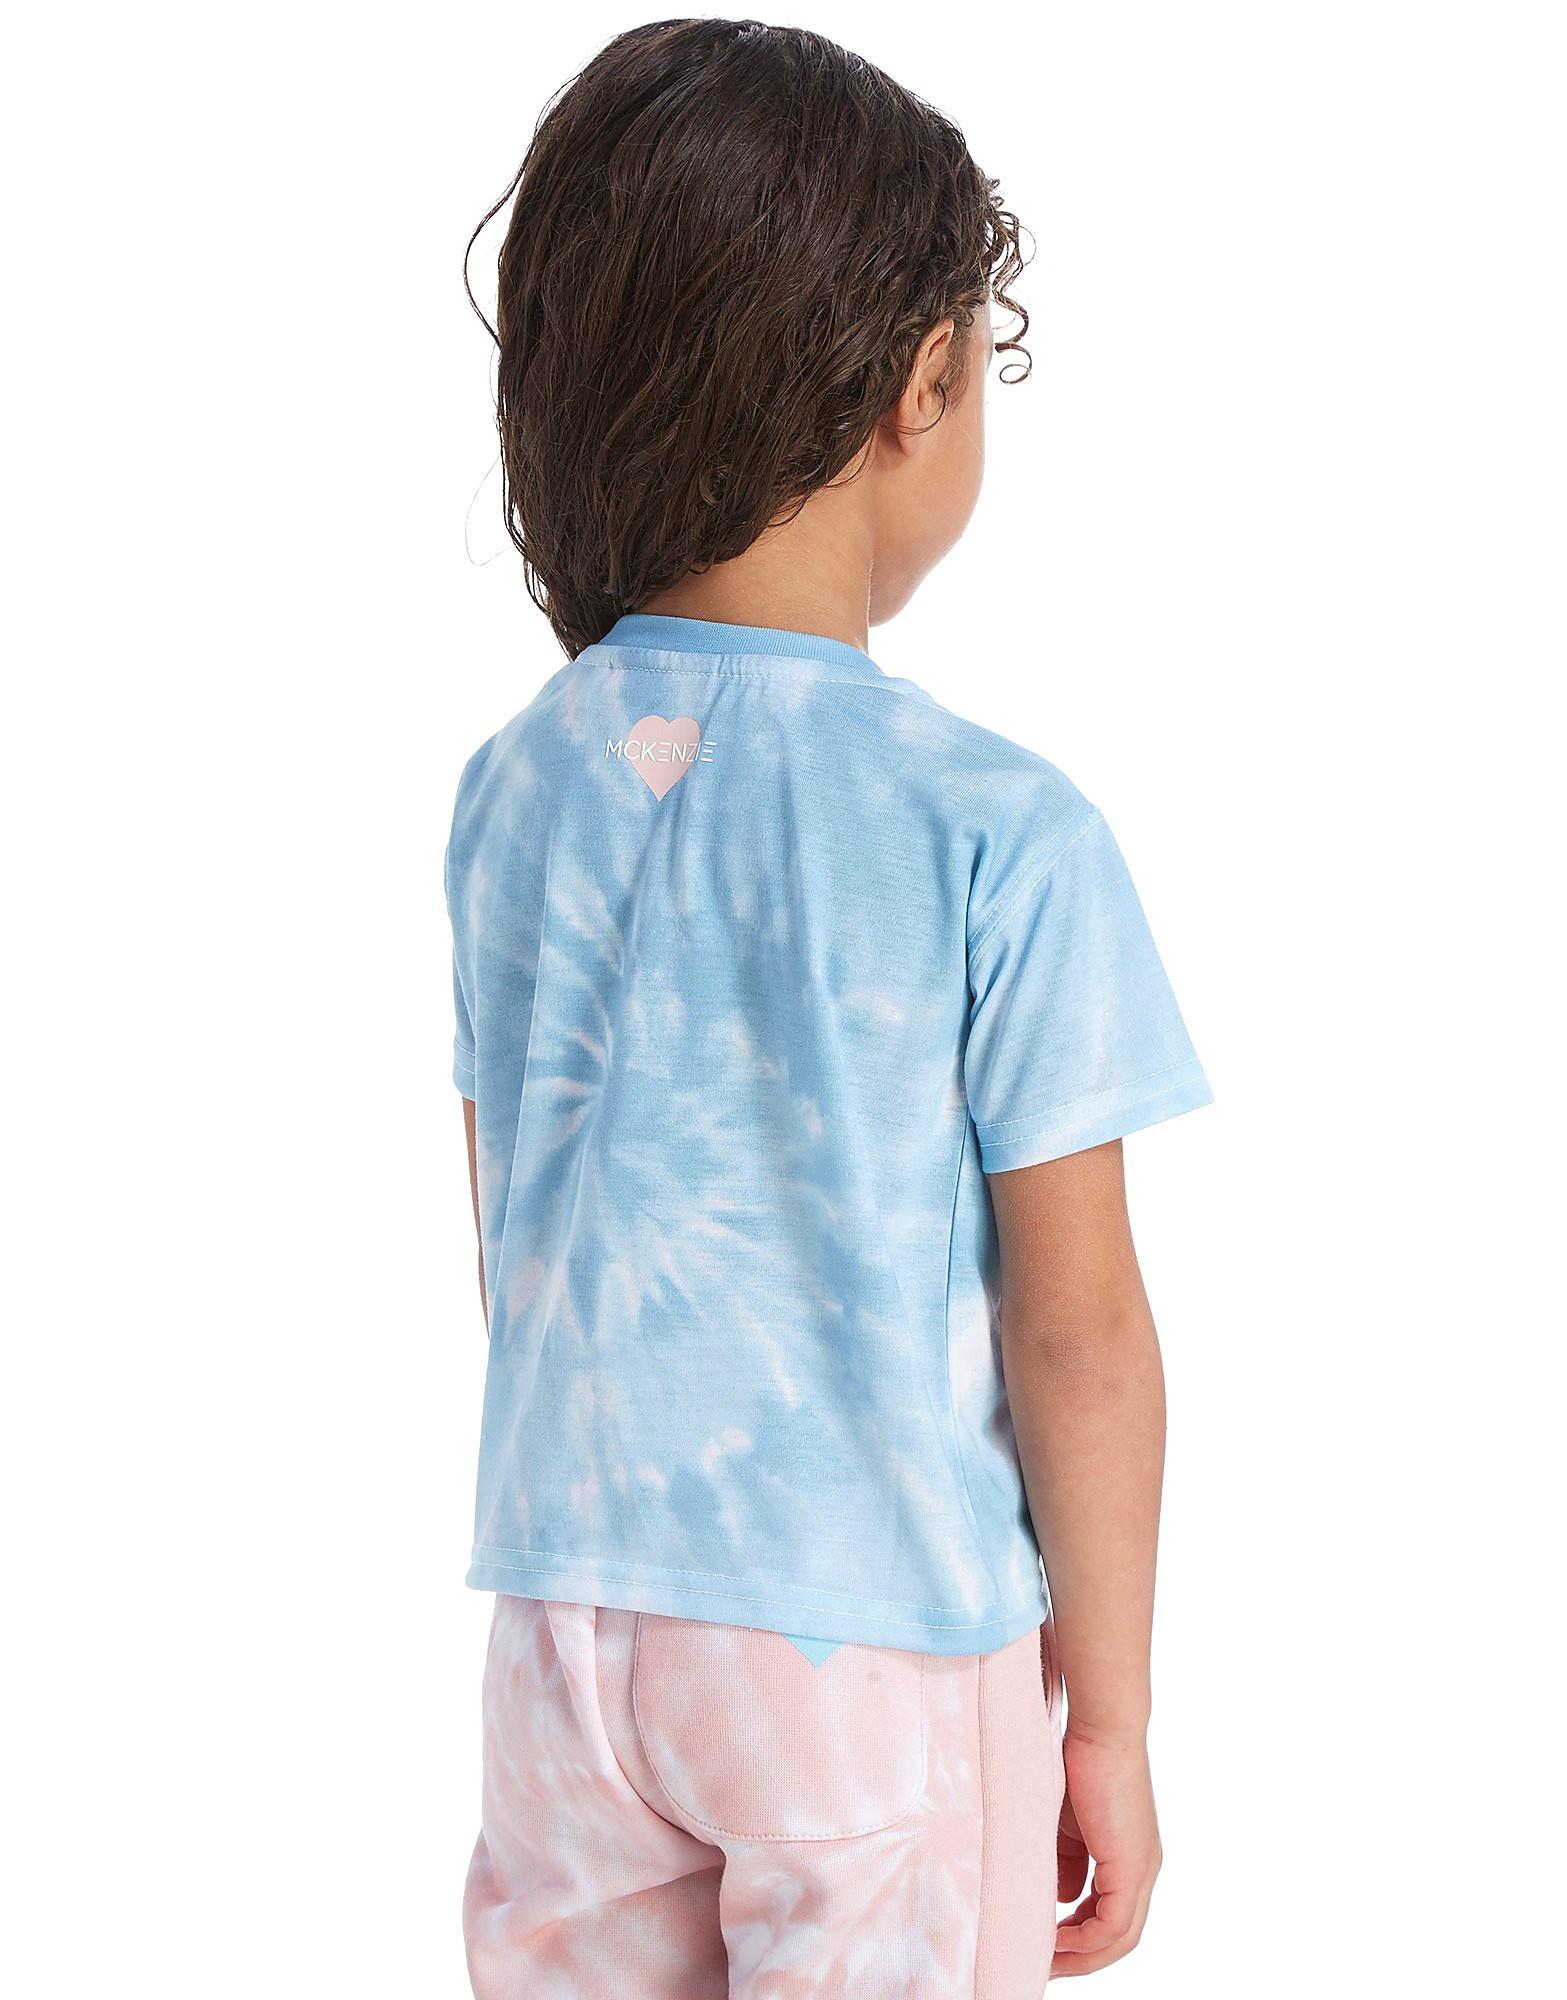 McKenzie Girls' Patsy T-Shirt Children